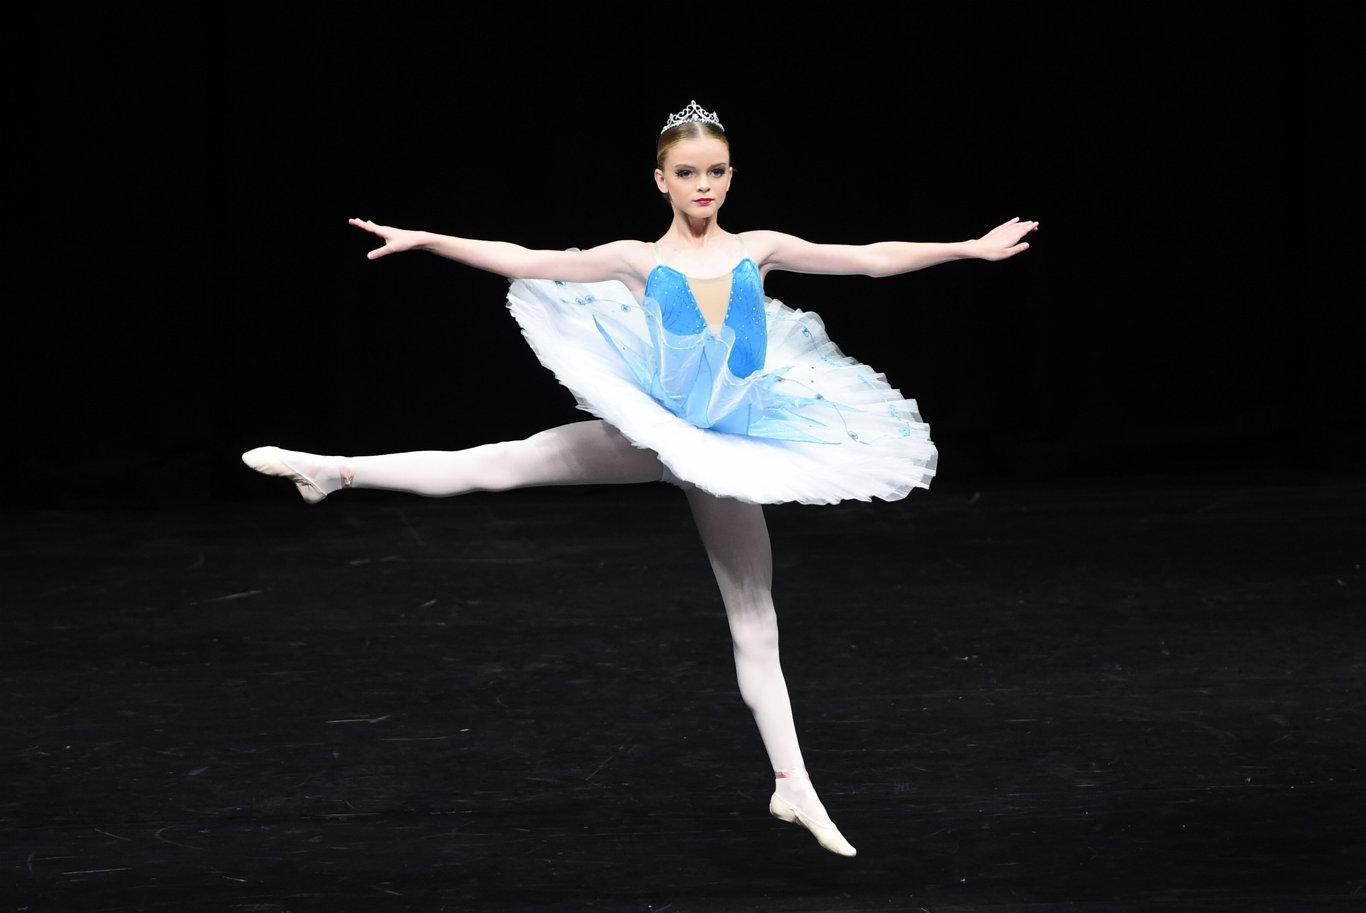 Maryborough Dance Eisteddfod - 14 years & under Classical Ballet Solo - Maya McPhee.